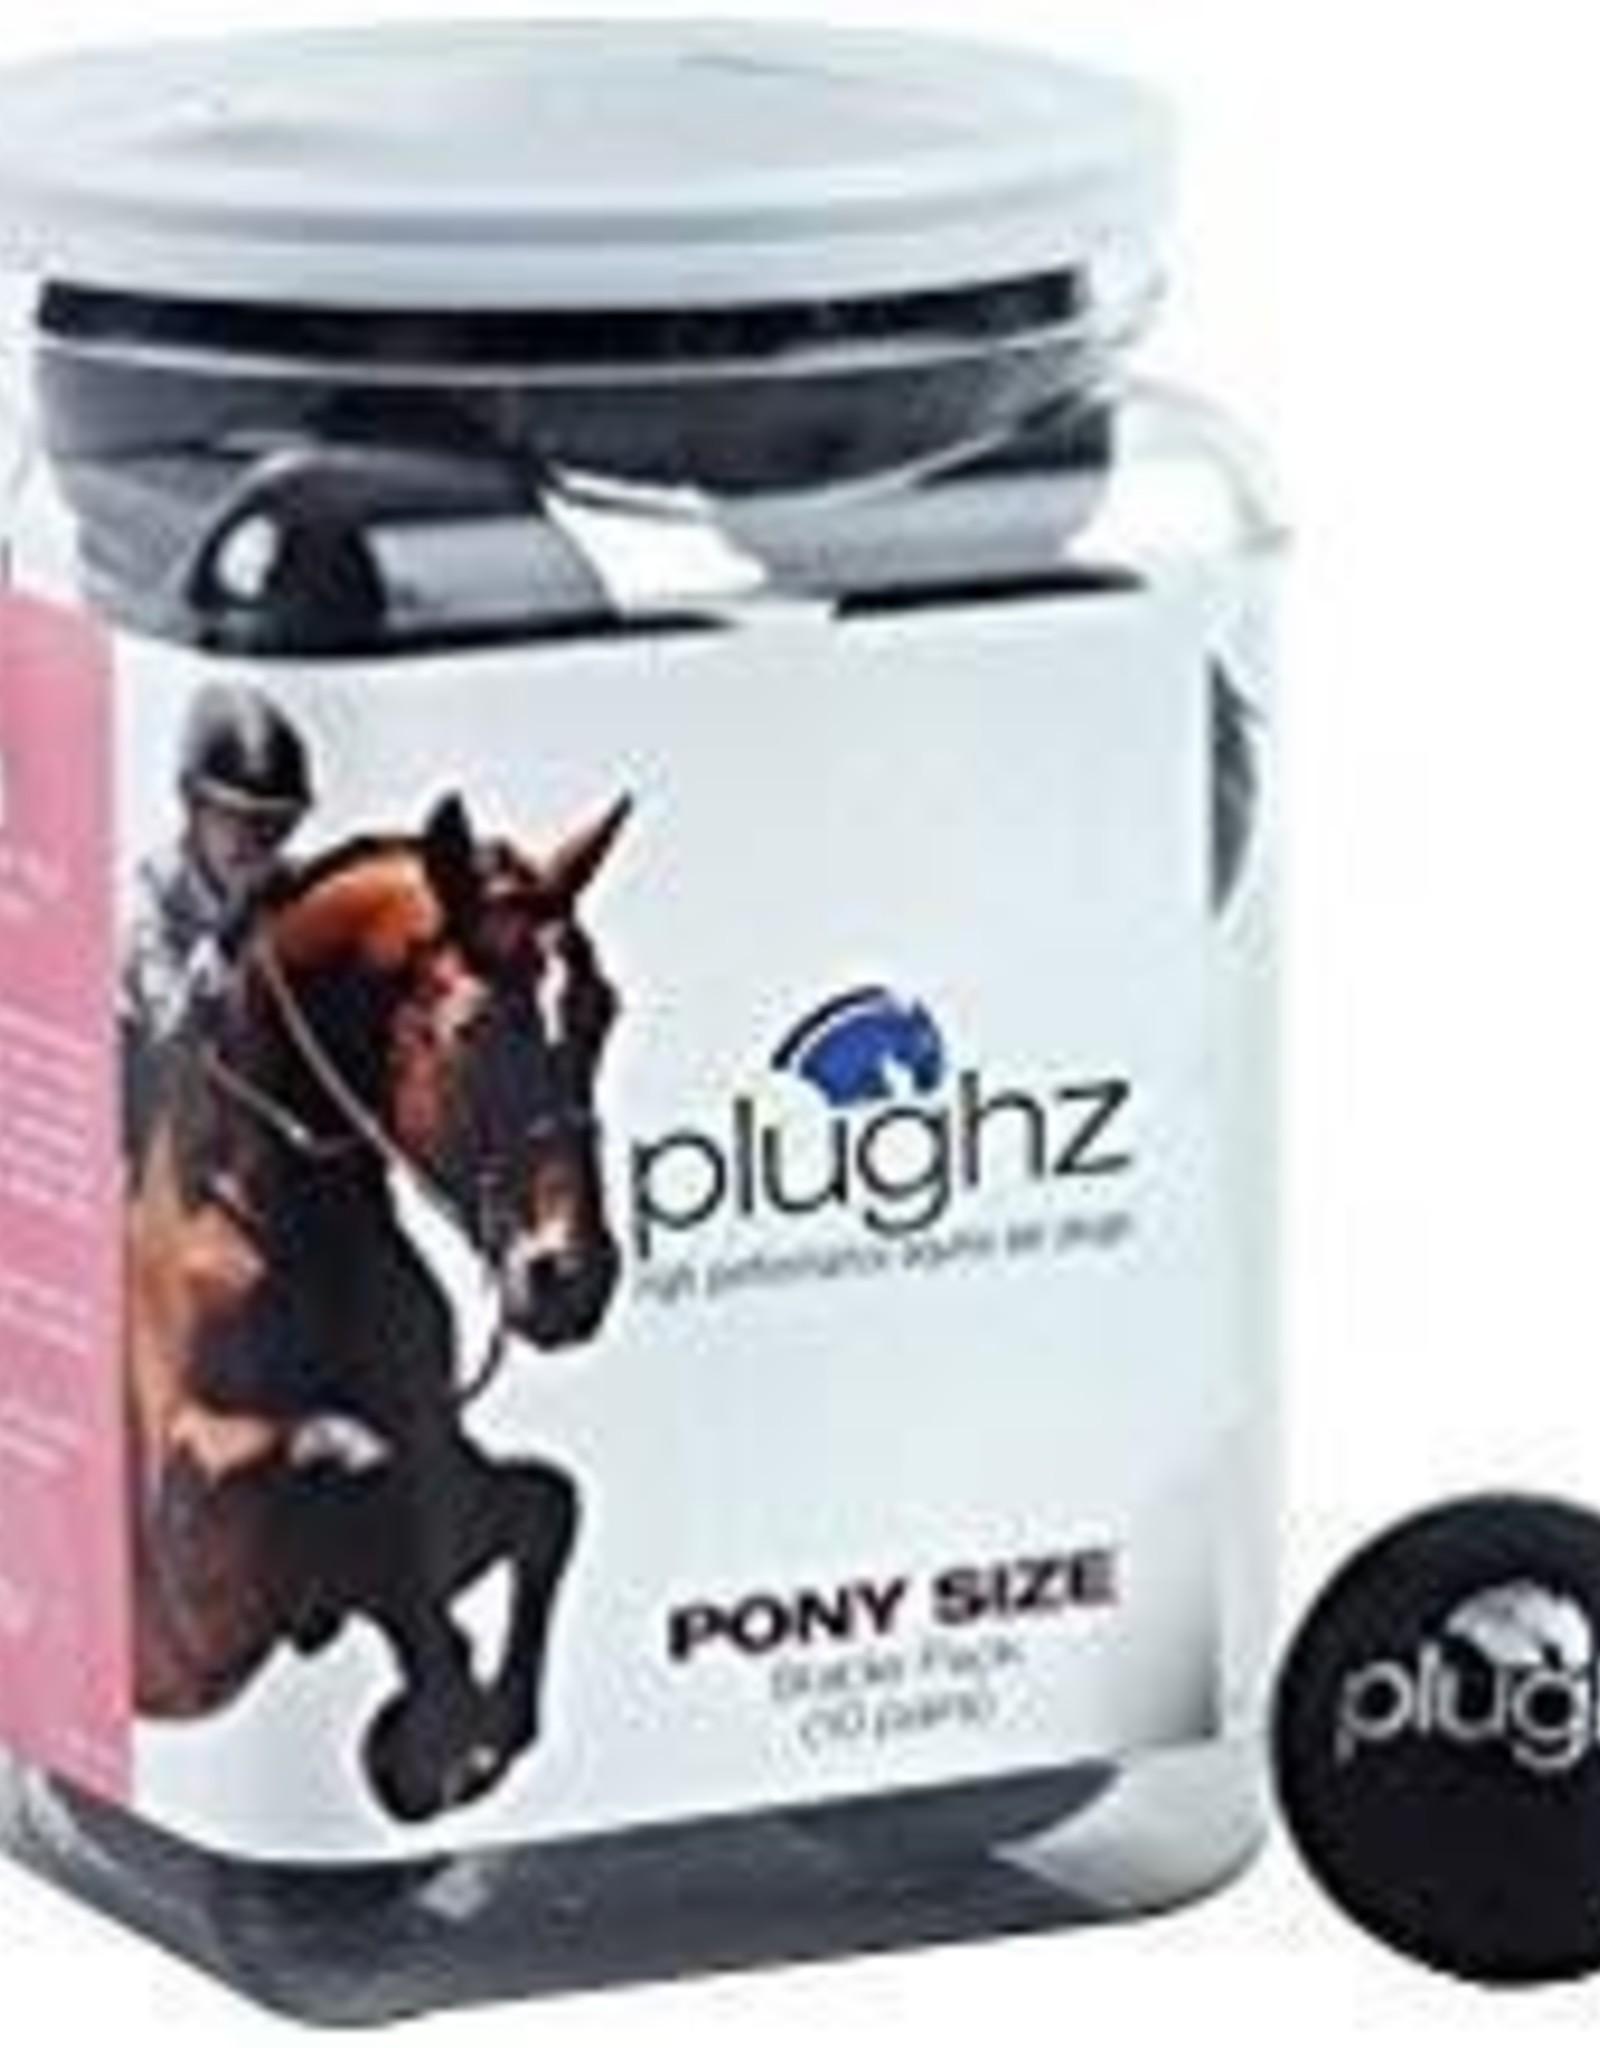 Plughz Plughz Equine Ear Plugs - 10 Pair